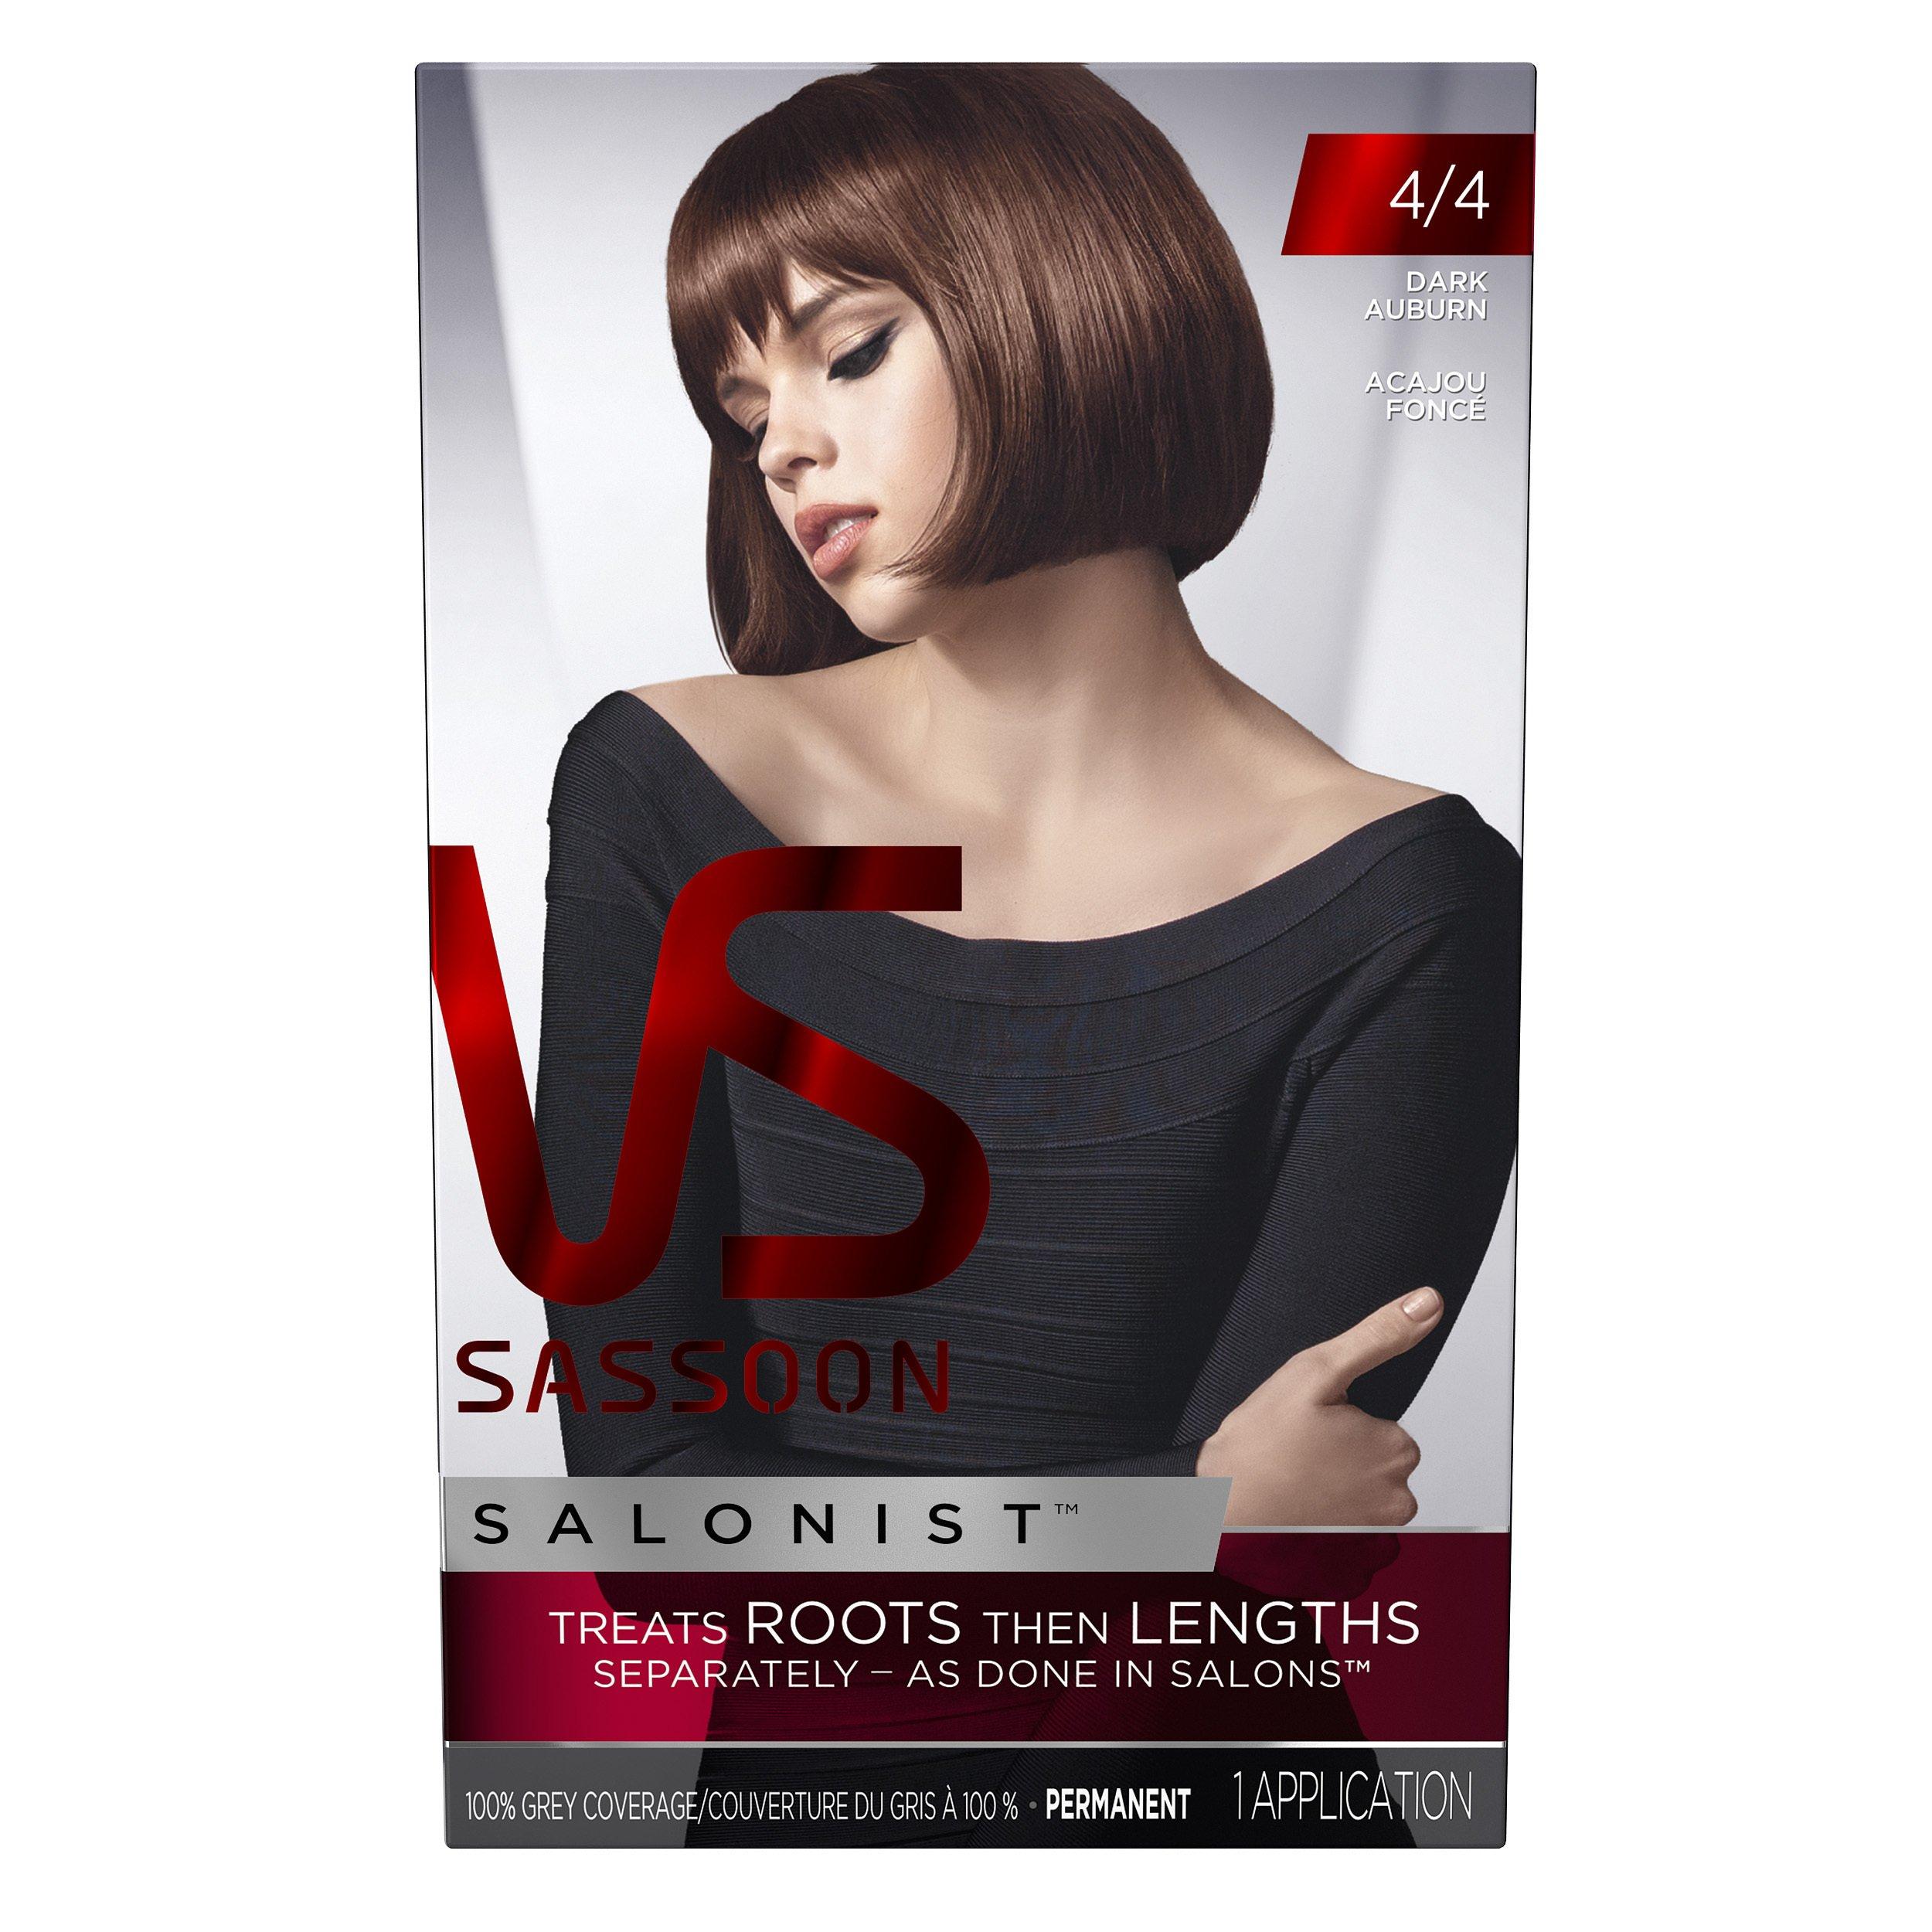 Vidal Sassoon Salonist Hair Colour Permanent Color Kit, 4/4 Dark Auburn by Vidal Sassoon